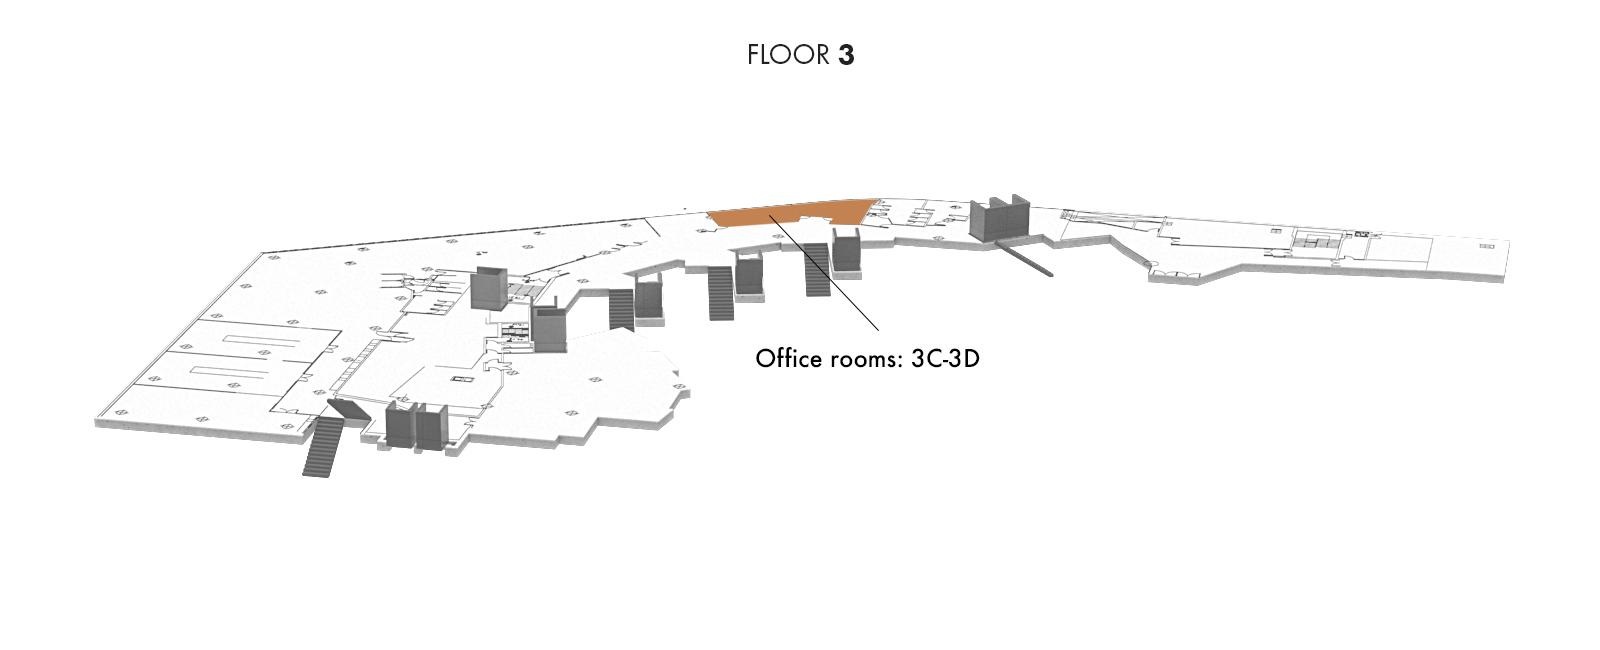 Office rooms: 3C-3D, Floor 3   Palacio Euskalduna Jauregia